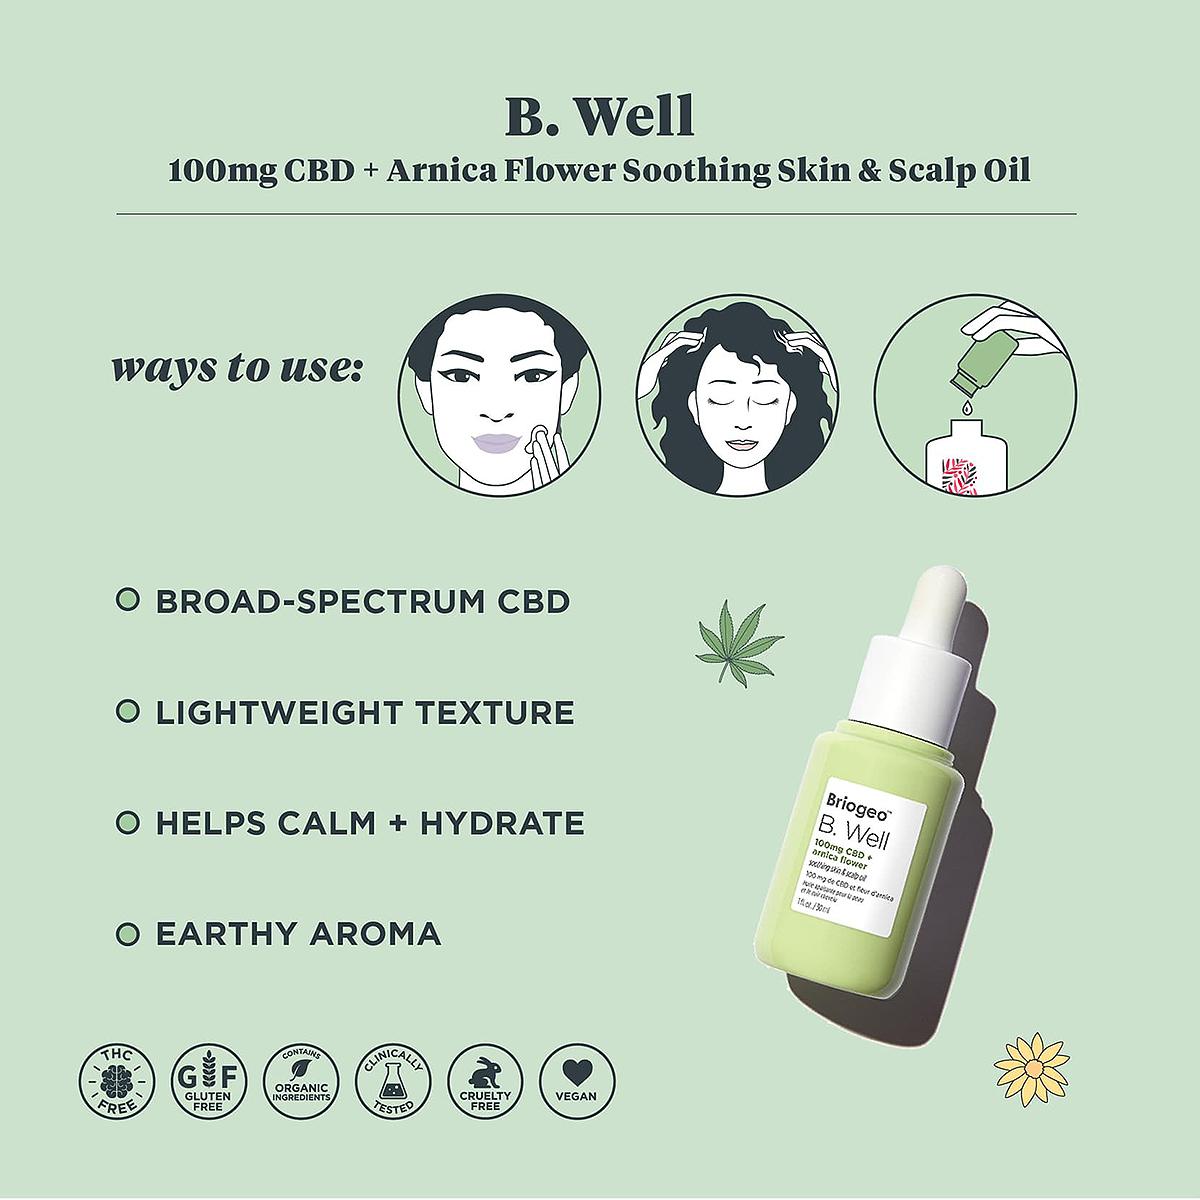 Briogeo B. Well 100mg CBD + Arnica Flower Soothing Skin & Scalp Oil